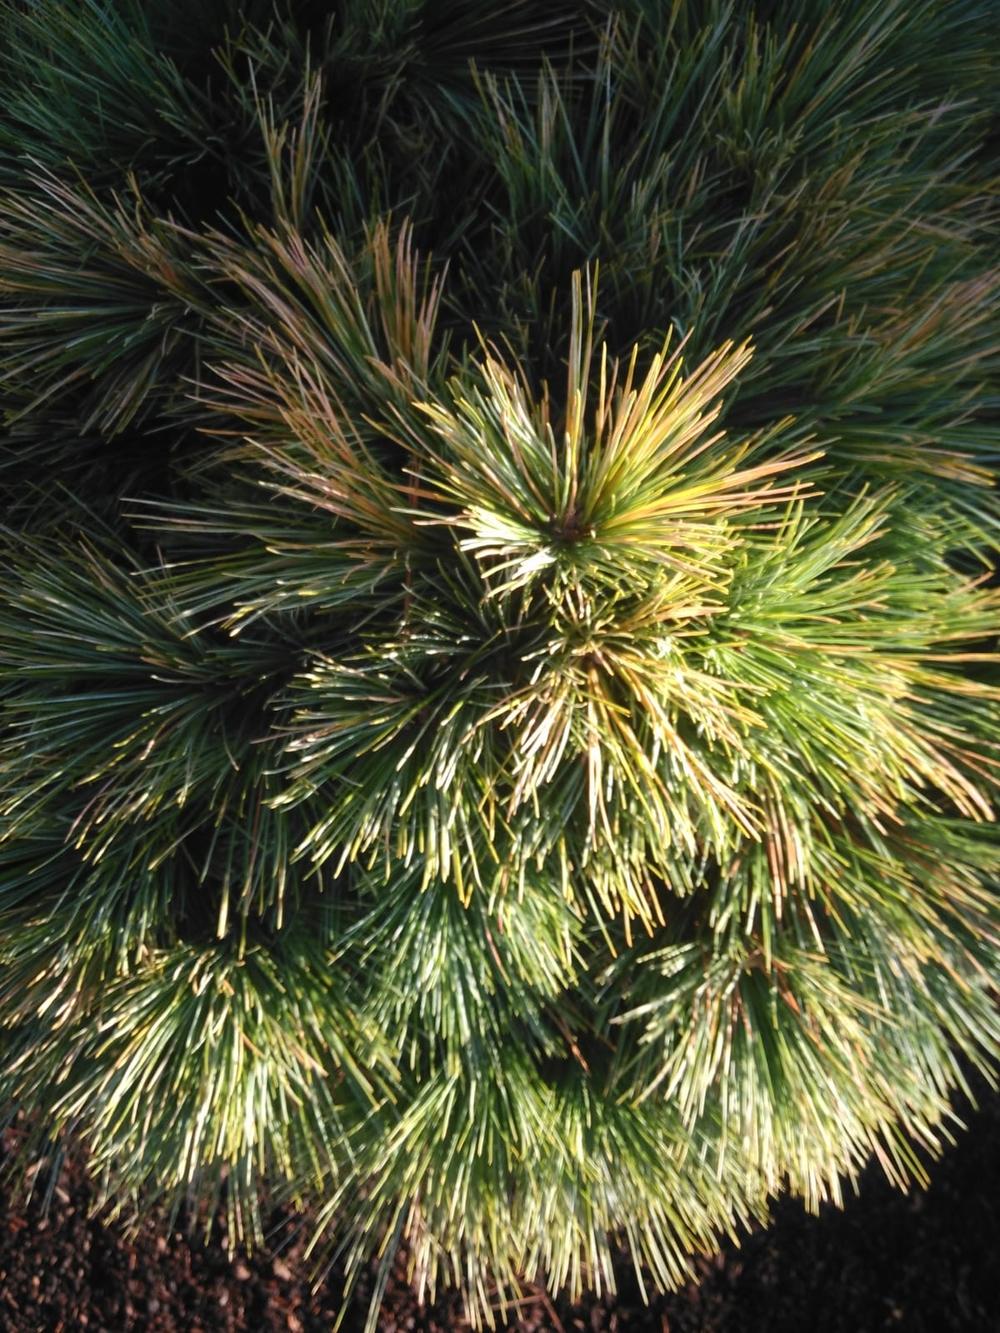 Gartenbonsai_Pinus_Strobus_Radiata (2)